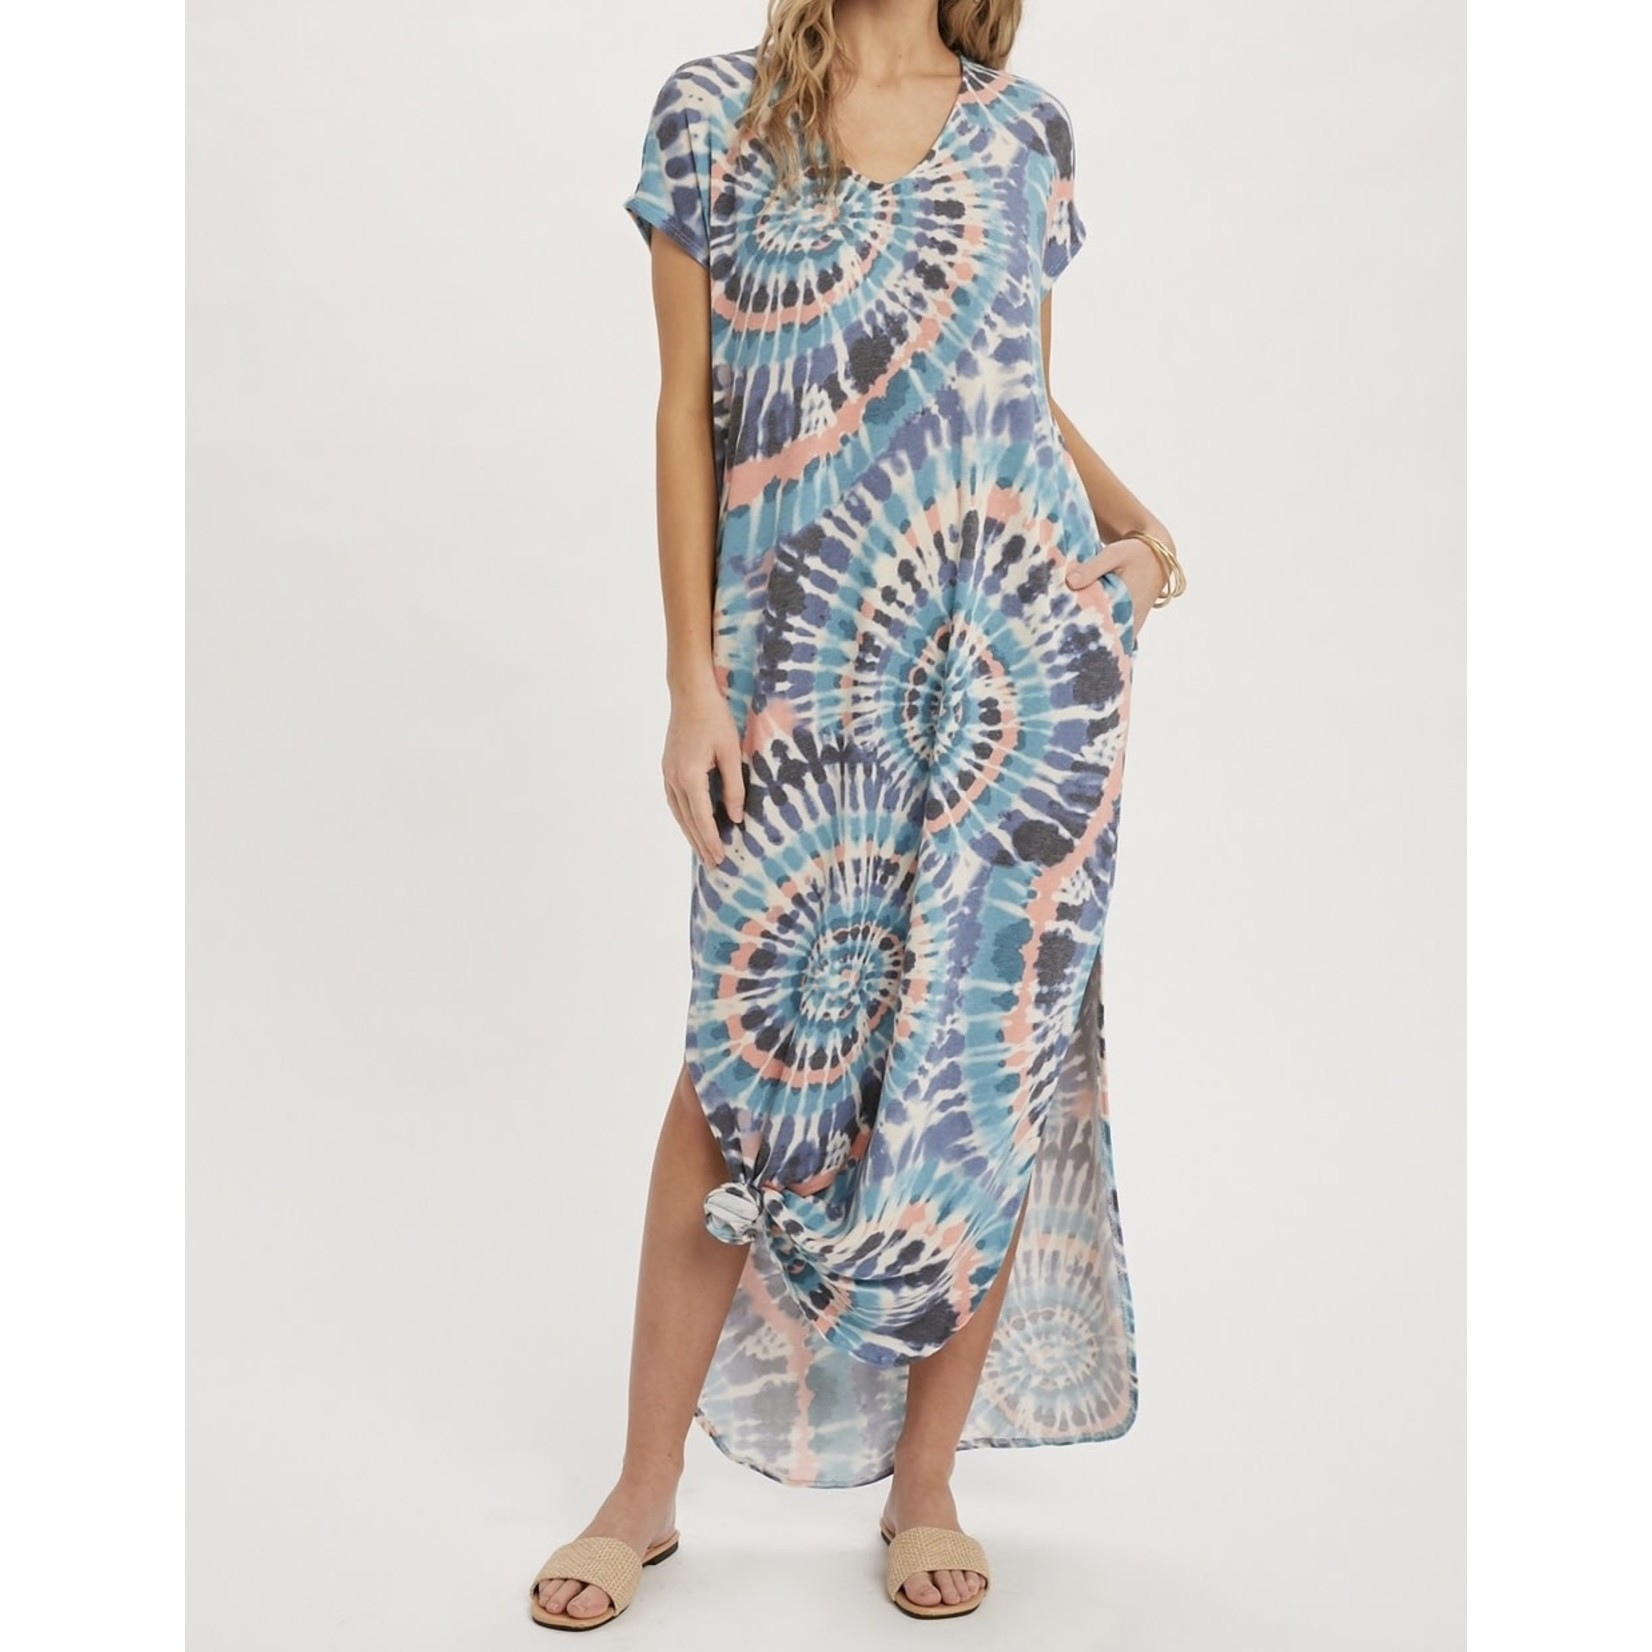 Blueivy Dress: Teal Blue Tie Dye Maxi + Pockets